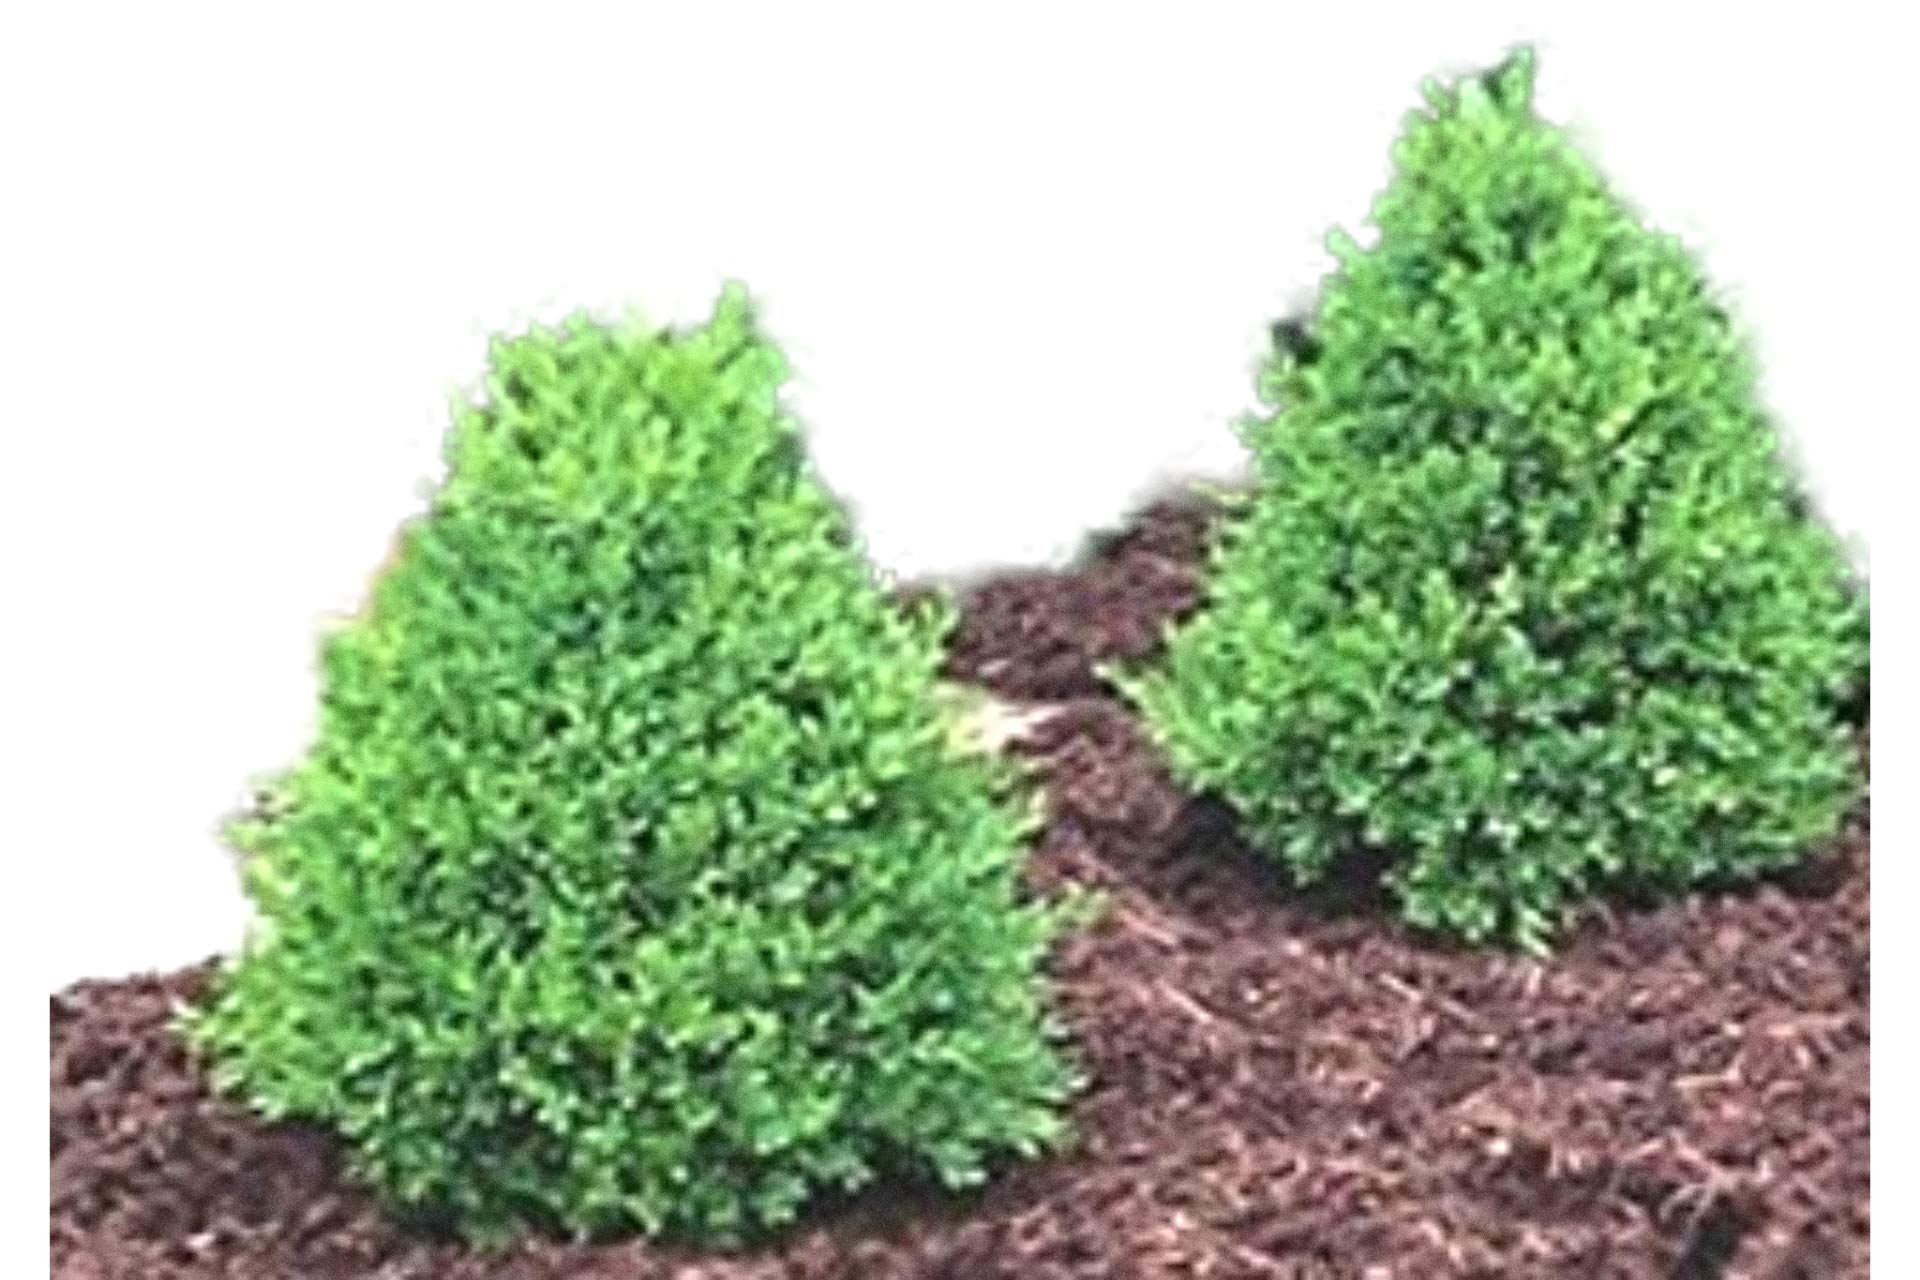 Green Mountain Boxwood - Quantity 10 Live Plants in Quart Pots by DAS Farms (No California)